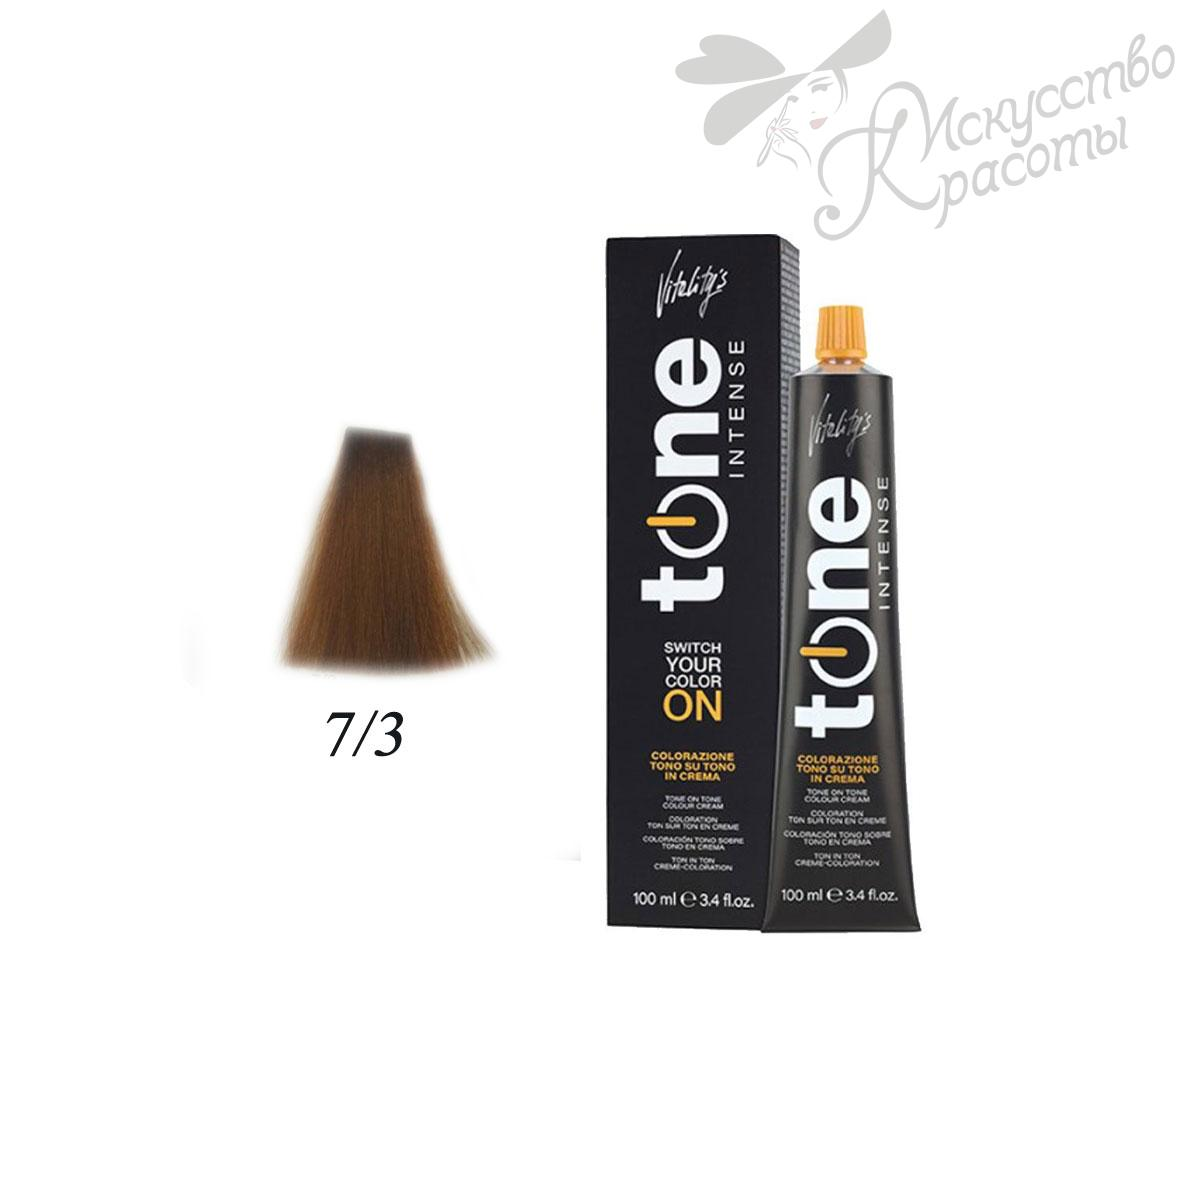 Краска для волос 7/3 золотистый блонд Tone Intense Vitality's 100мл